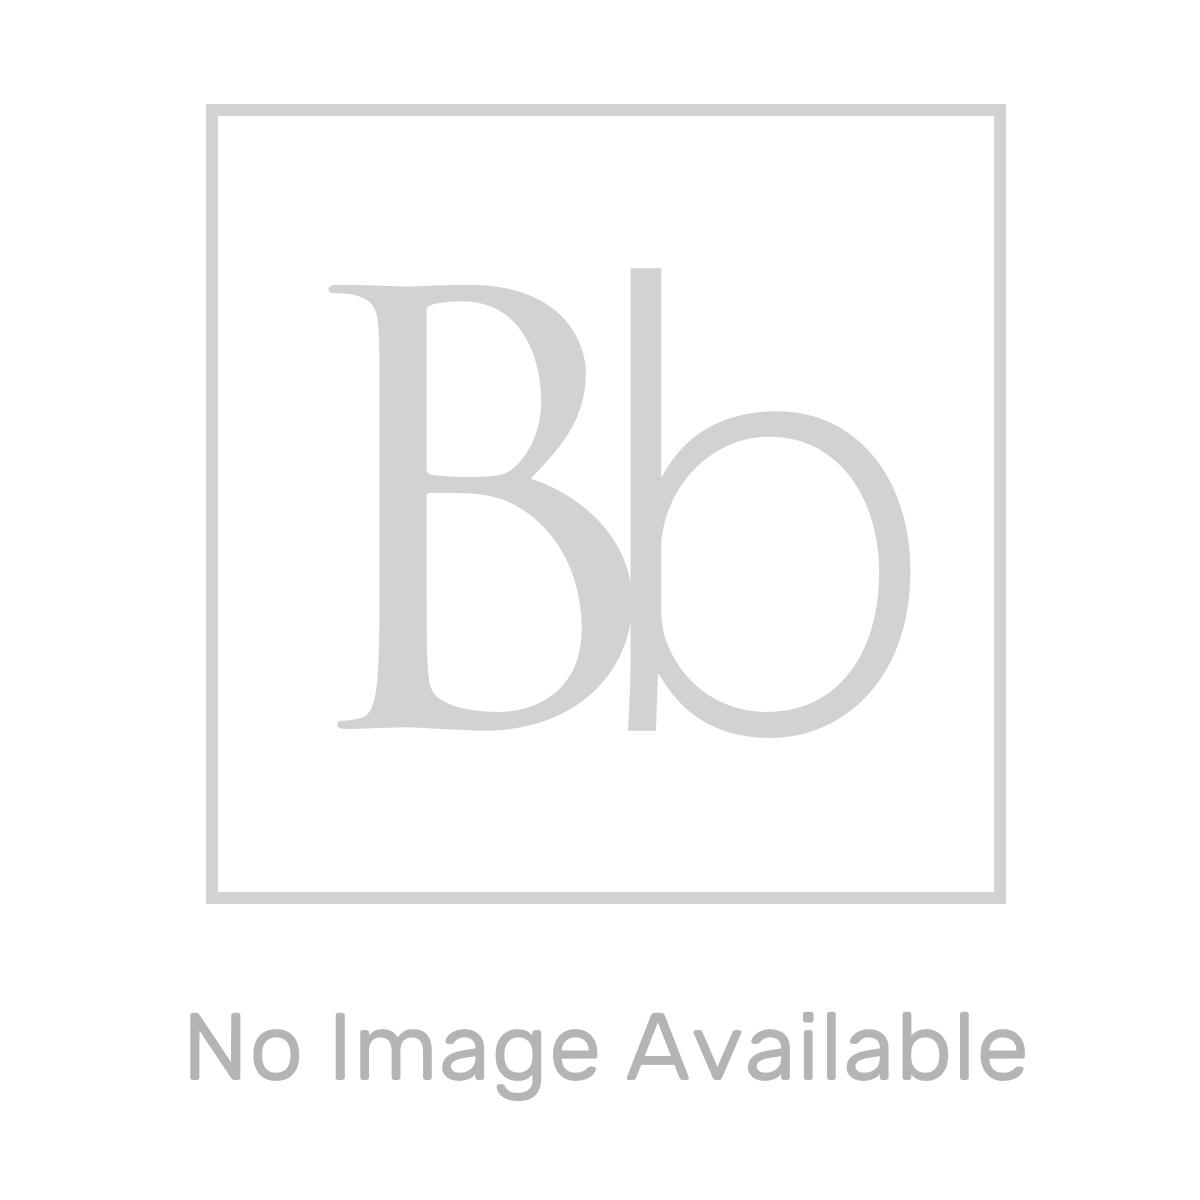 HiB Rotary Portrait LED Back-Lit Bathroom Mirror